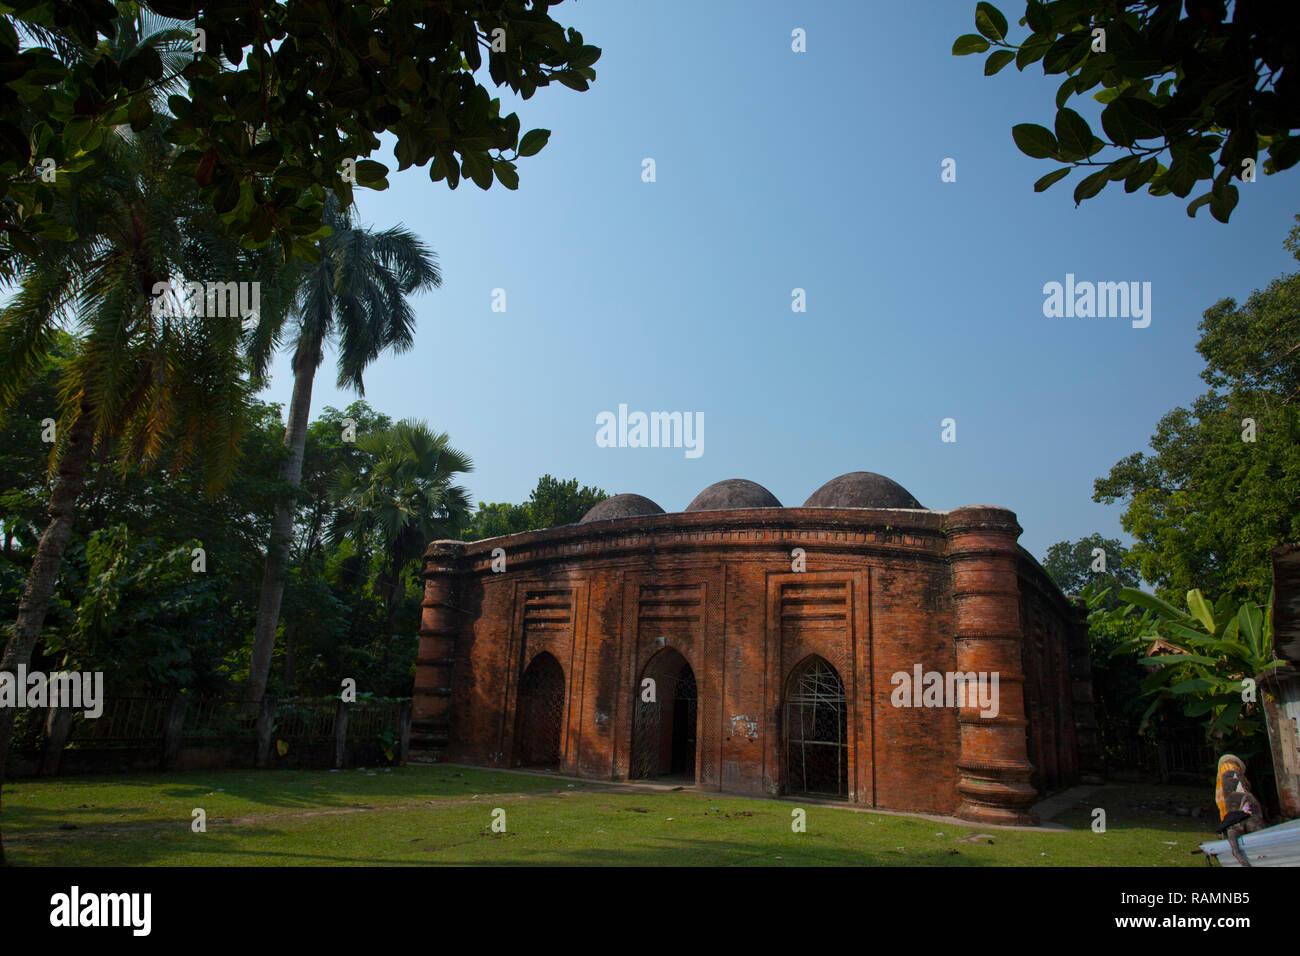 Nine Domed Mosque. Bagerhat, Bangladesh. - Stock Image